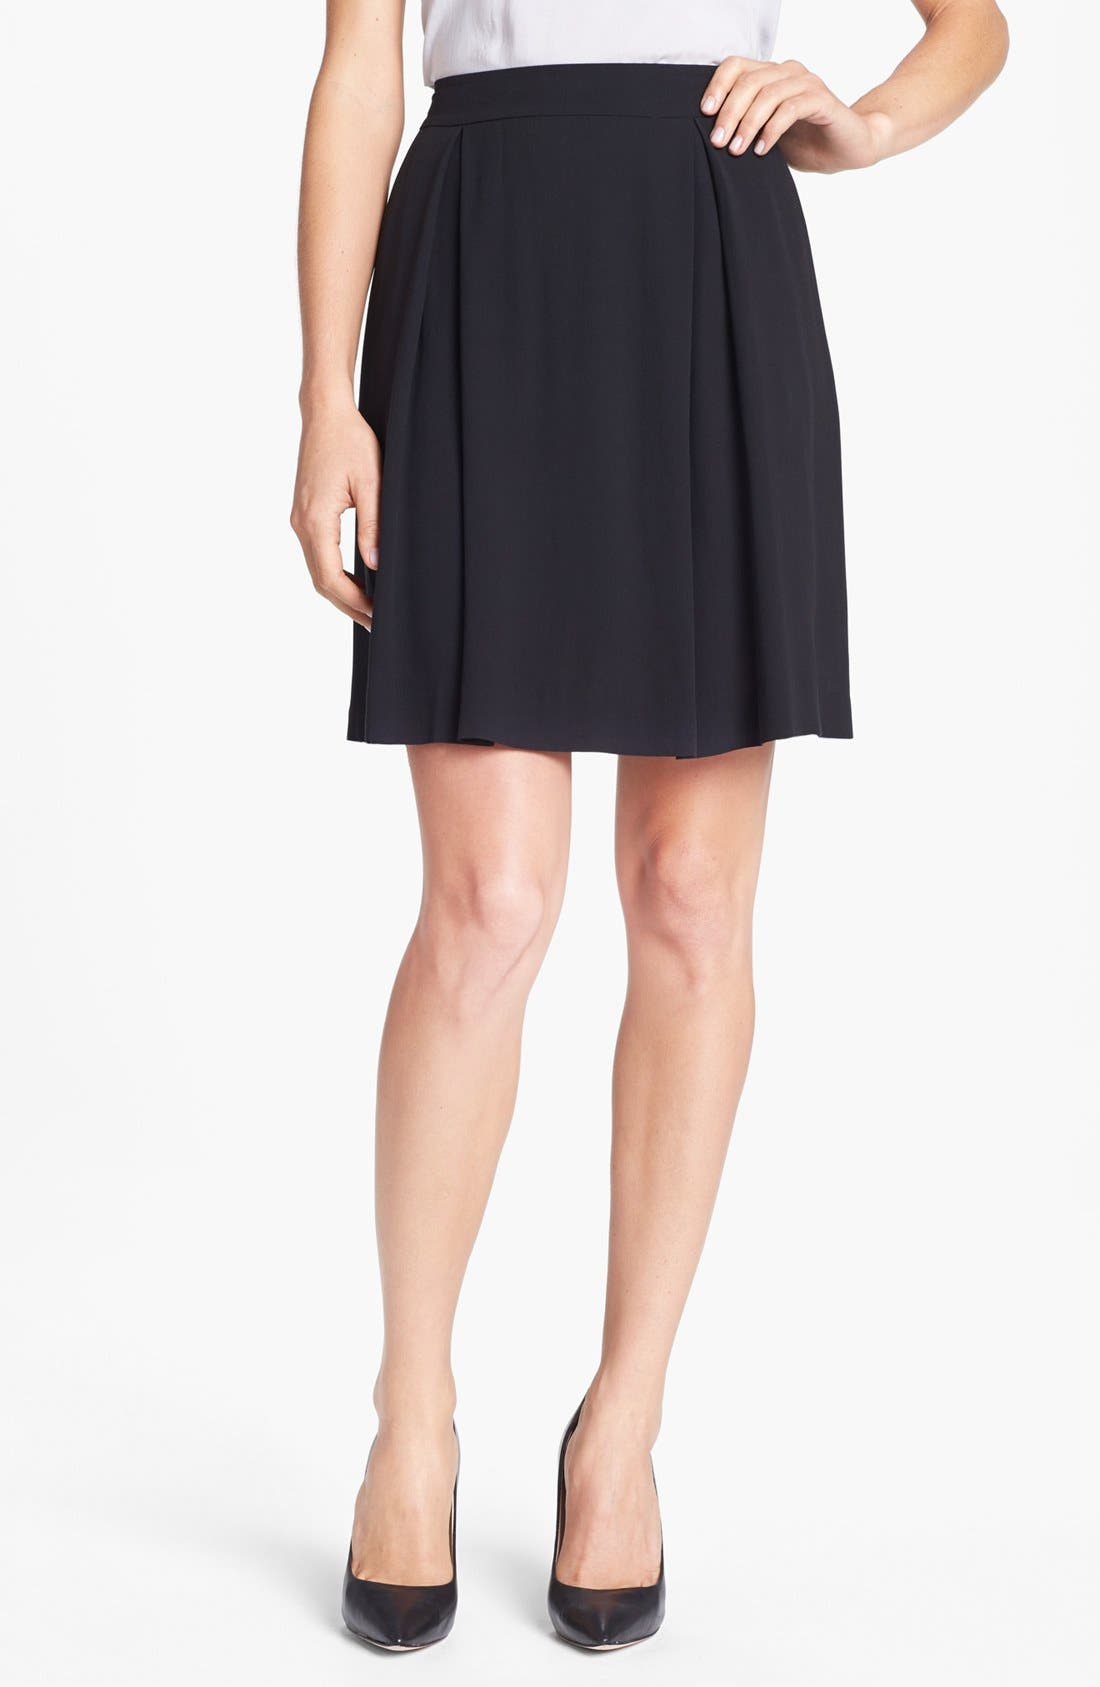 Alternate Image 1 Selected - Eileen Fisher Textured Silk Georgette Skirt